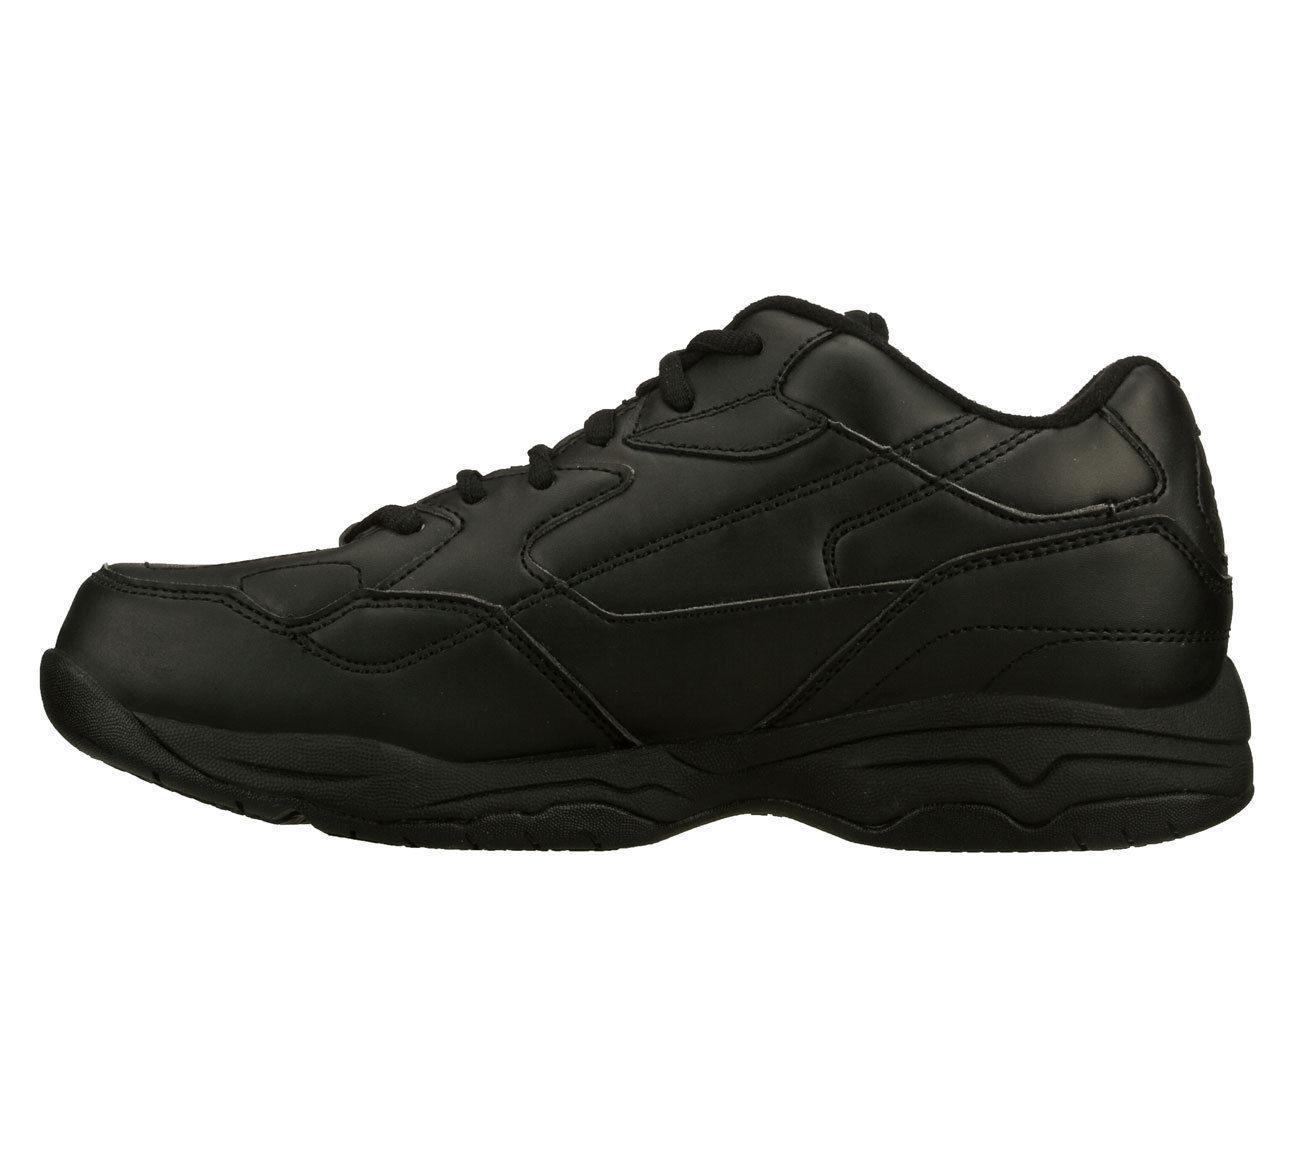 Work femmes Antidérapant 76555 Noir Skechers Chaussures Chaussures Chaussures en mousse à mémoire de forme Confort Casual 13314f